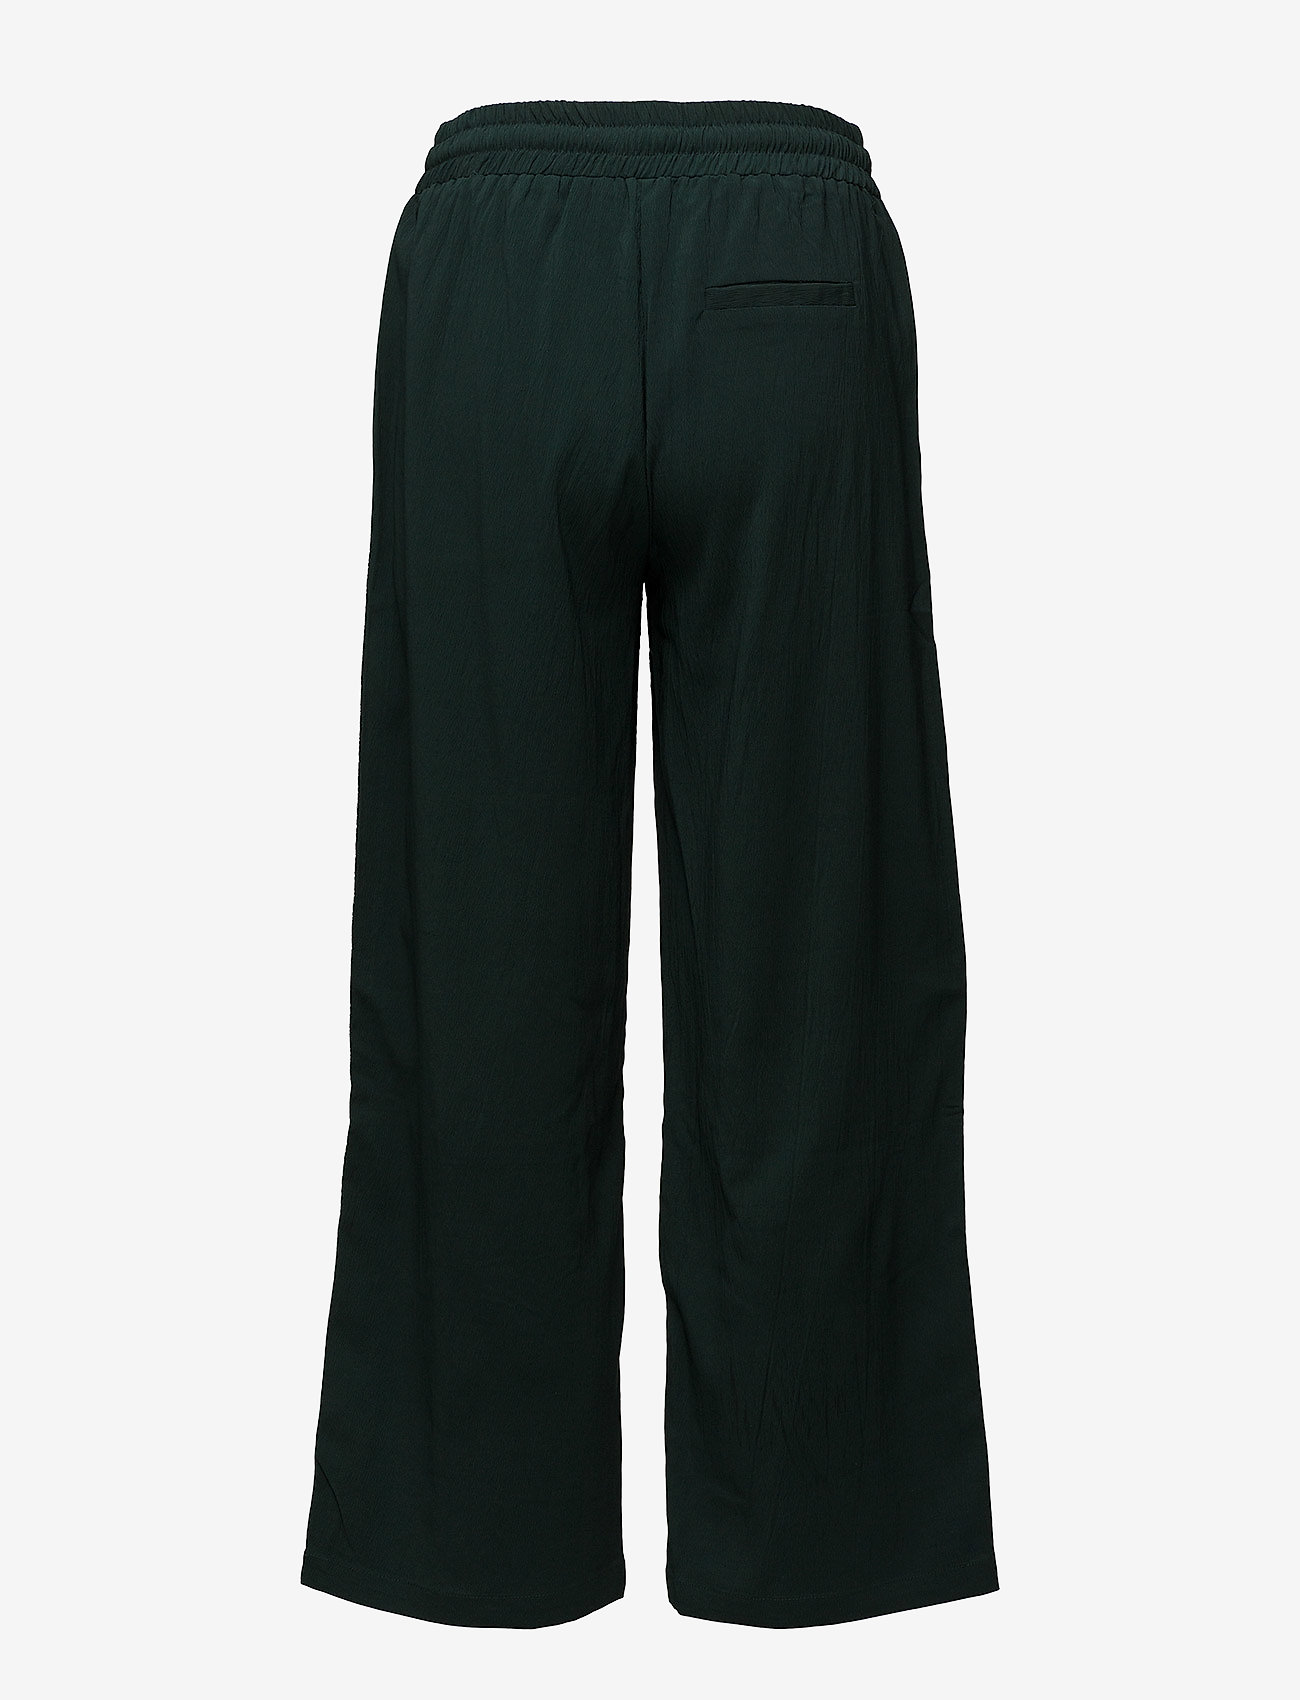 Coster Copenhagen - Pants w. tieband and elastic waist - wide leg trousers - emerald green